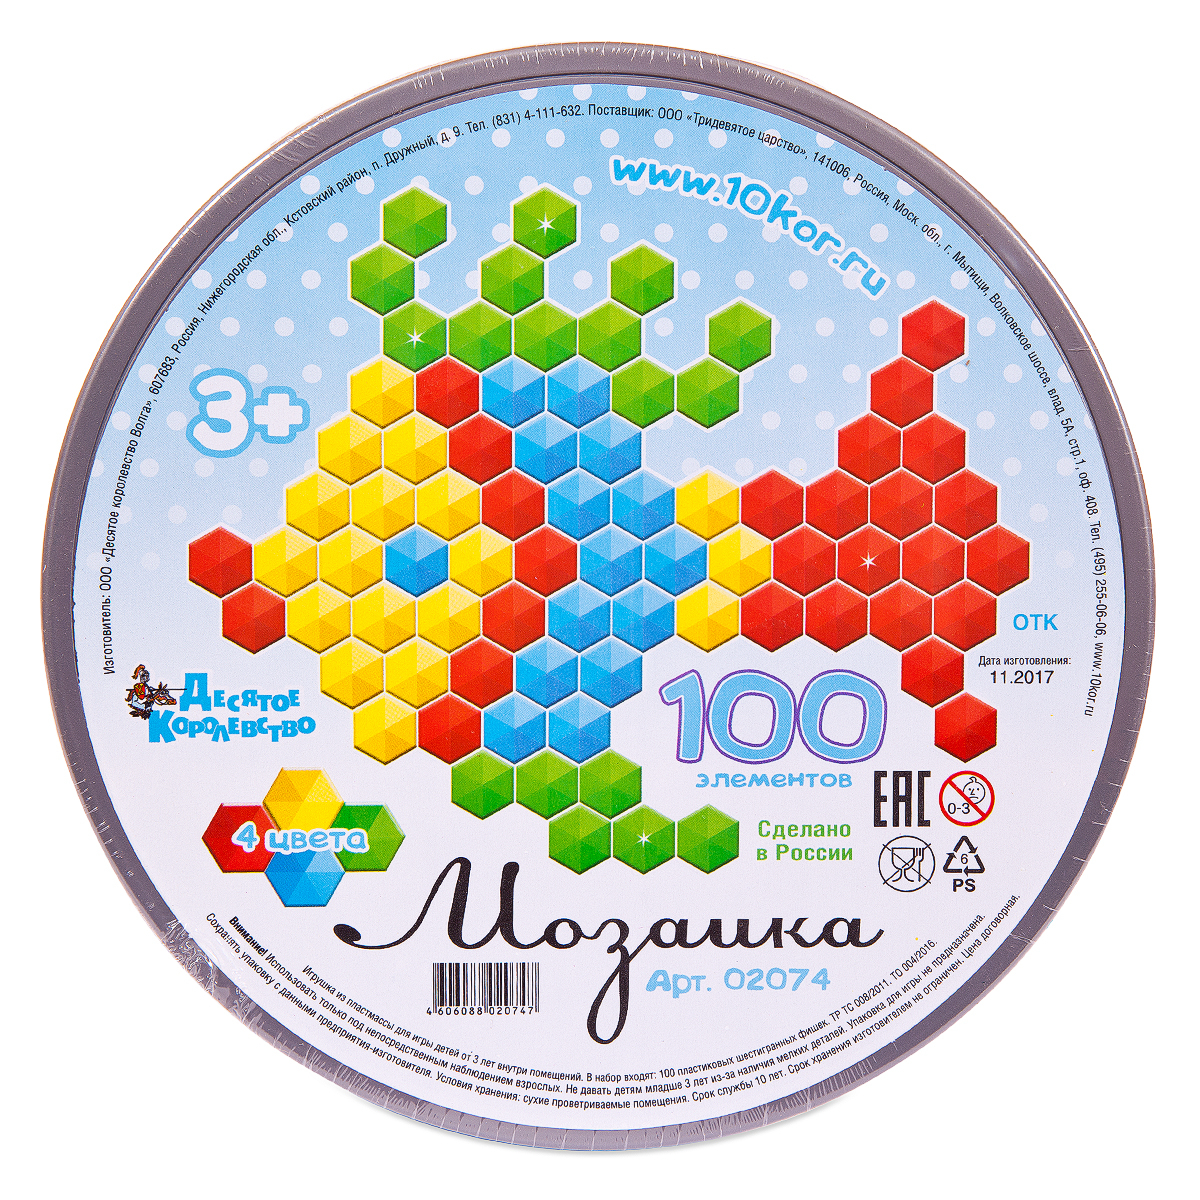 Пазлы Десятое королевство Круглая шестигранная, 100 шт. мозаики десятое королевство мозаика шестигранная 120 эл круглая пласт коробка